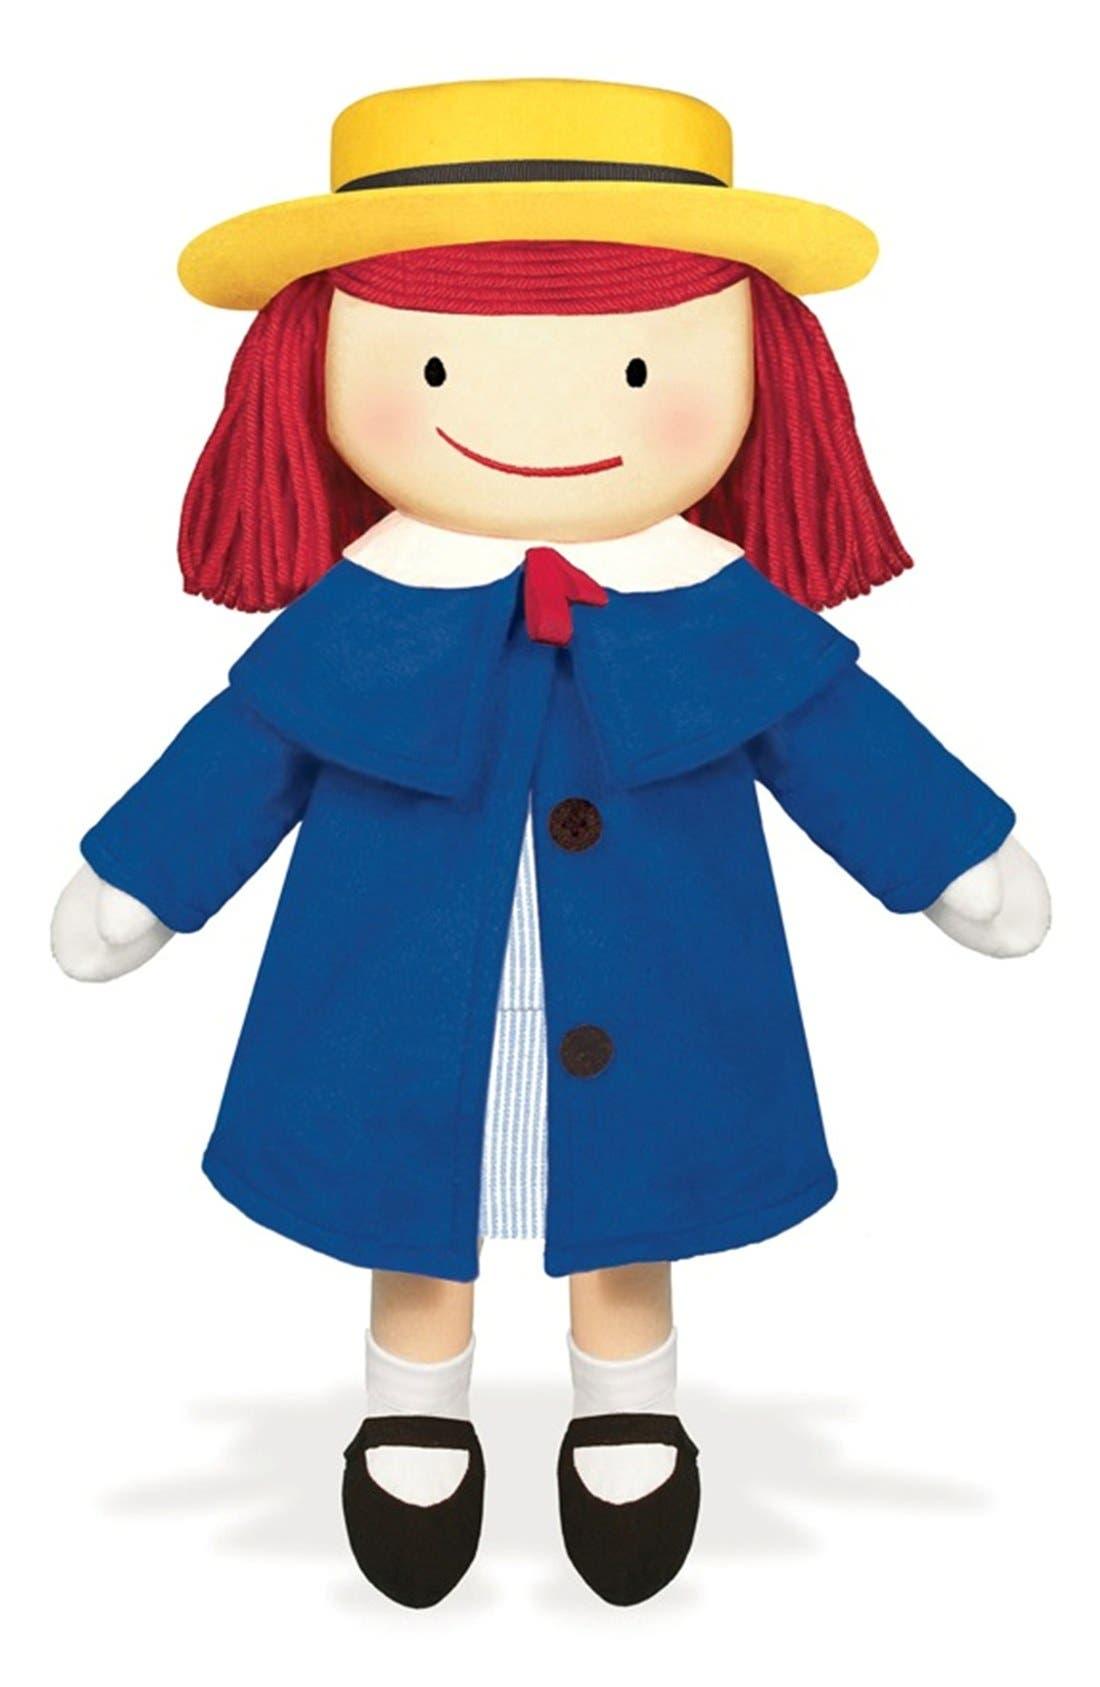 Main Image - yOttOy Madeline™ Stuffed Doll